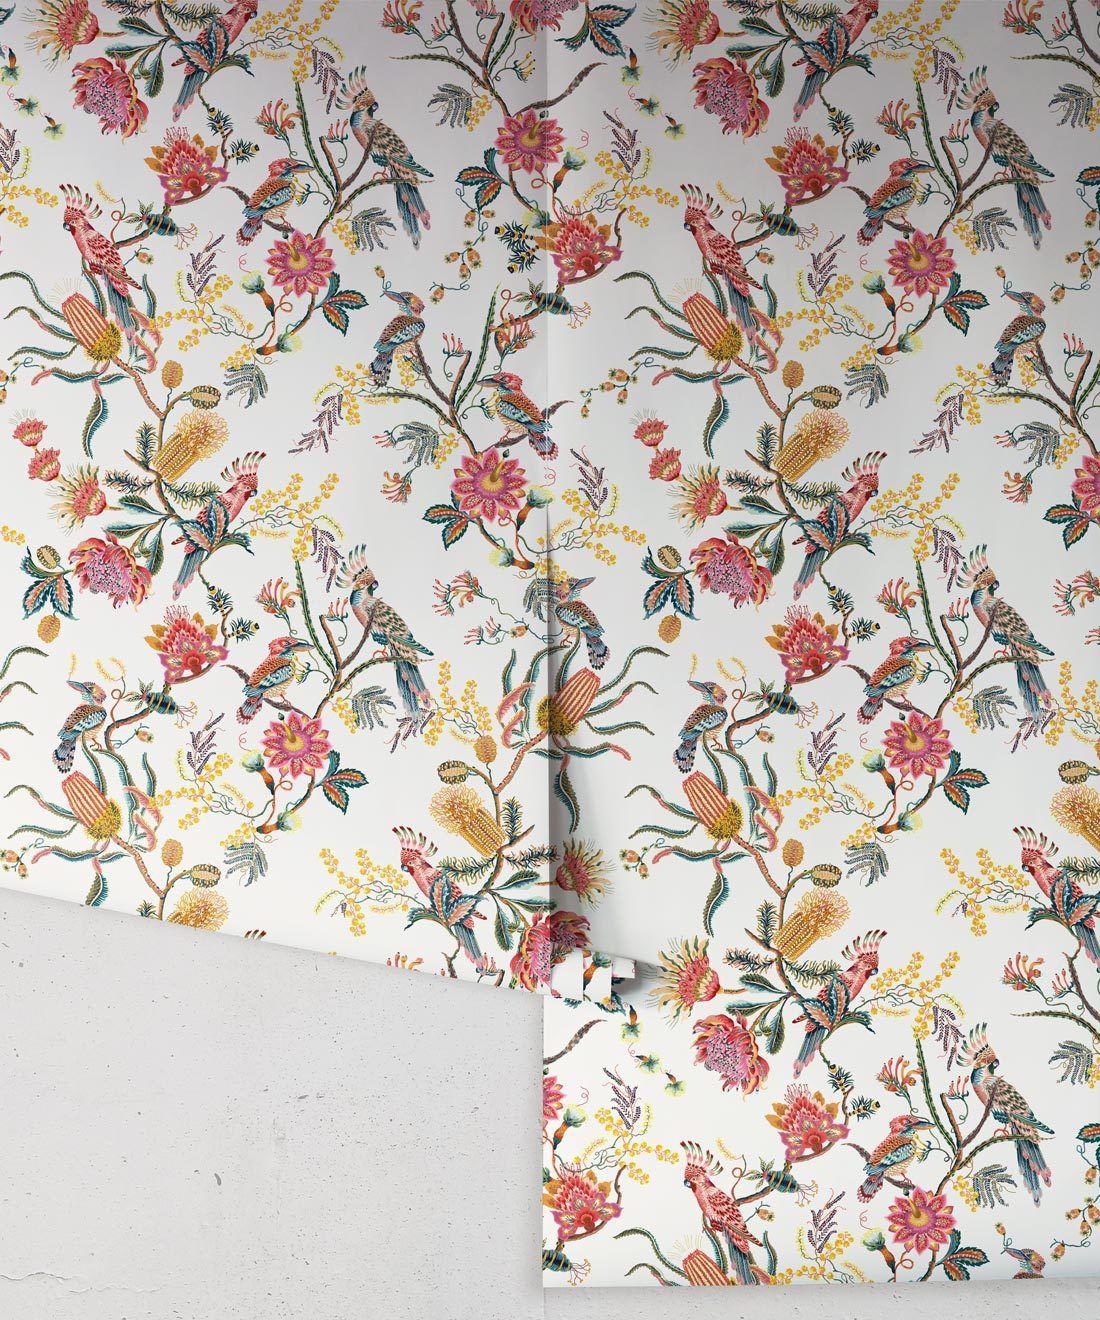 Matilda Wallpaper • Cockatoo, kookaburra • Australian Wallpaper • Milton & King USA • Oceania Roll